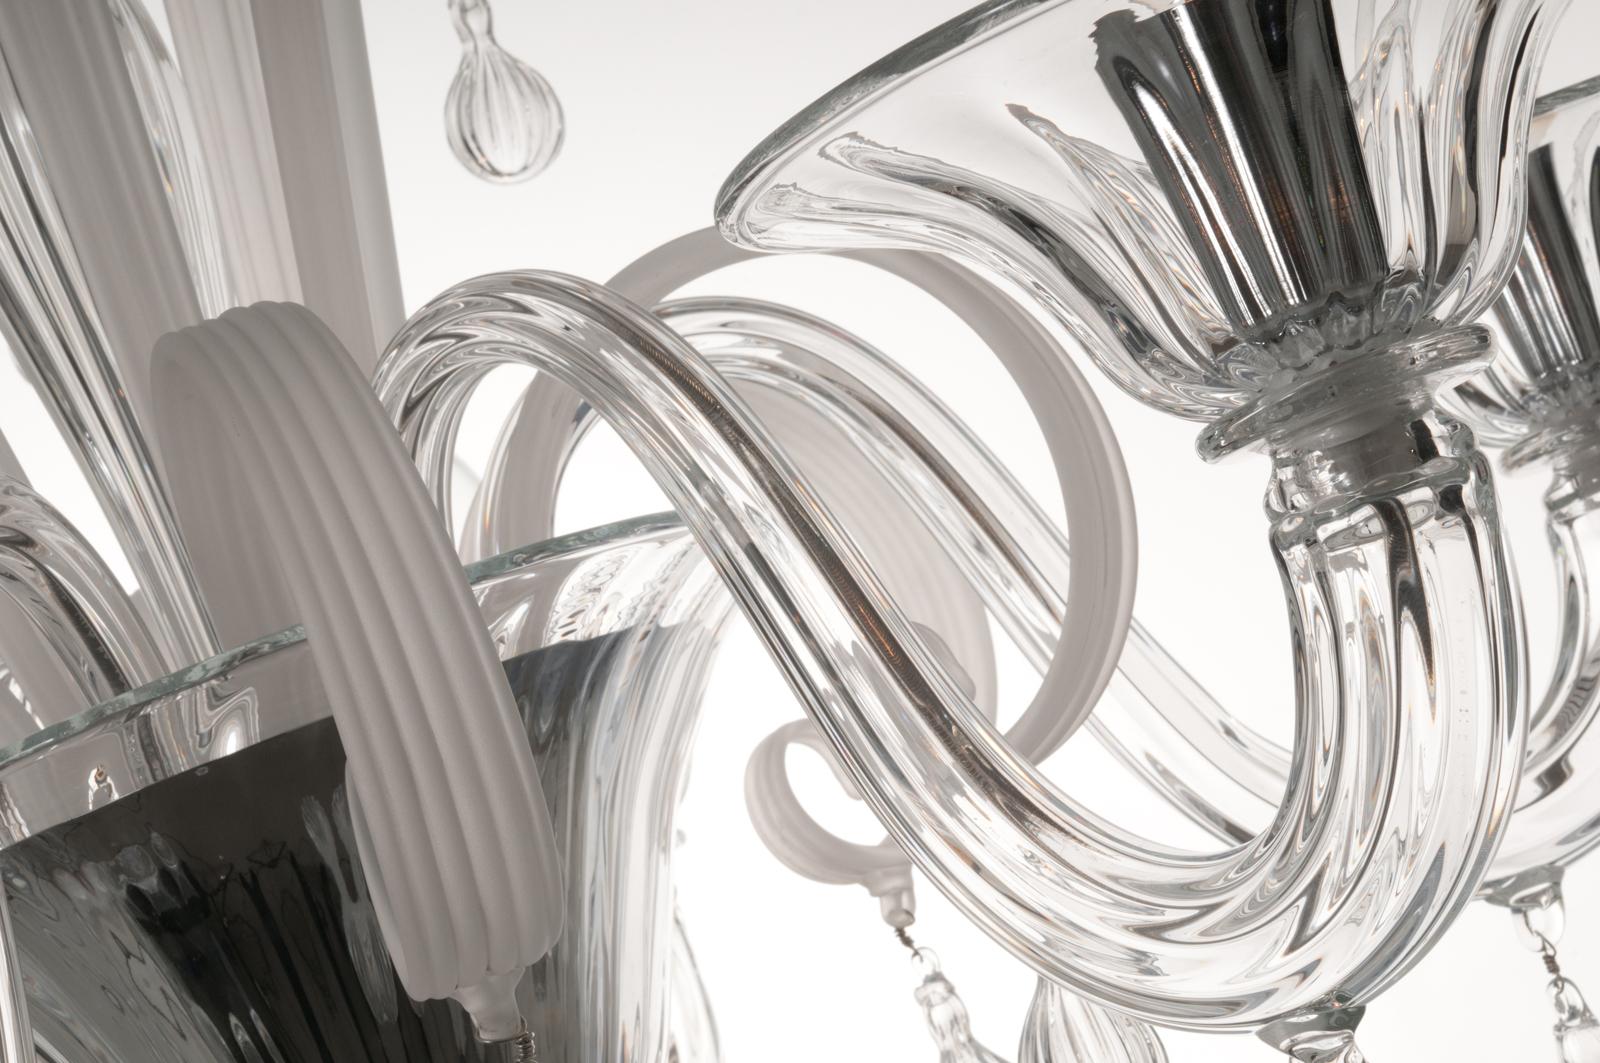 Soie-lustre-chandelier-veronese-4.jpg